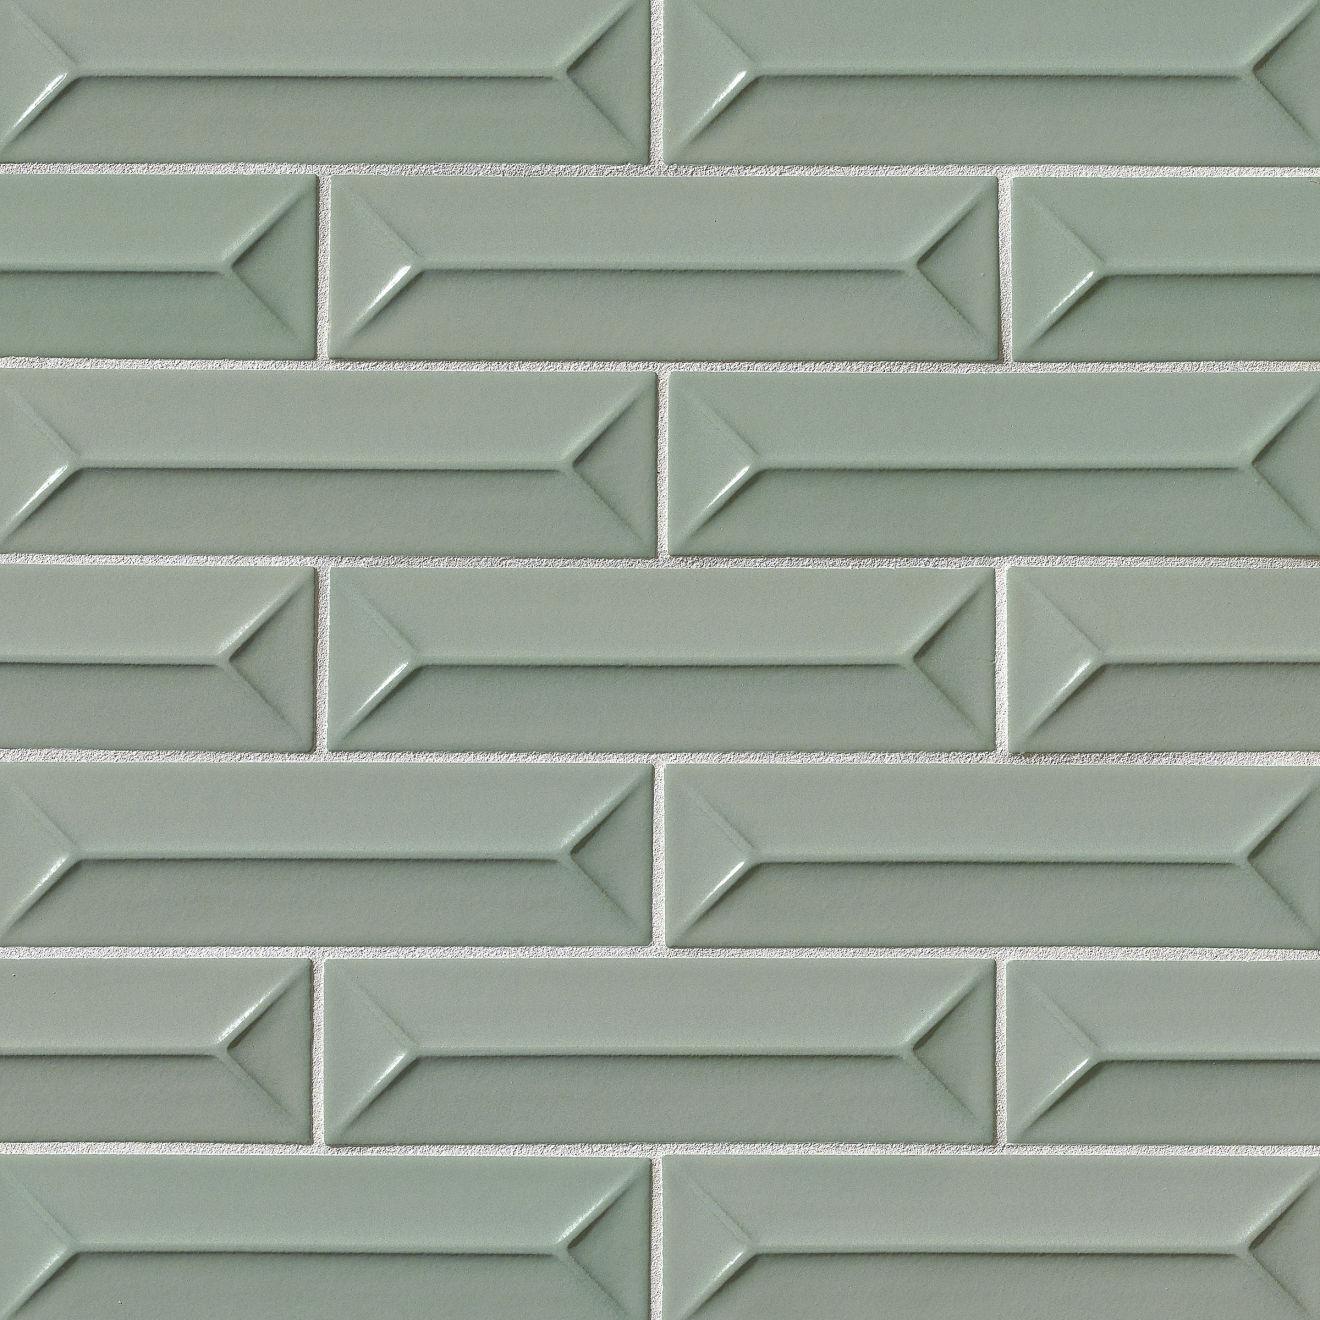 "Costa Allegra 2.5"" x 9"" Decorative Tile in Gulf"